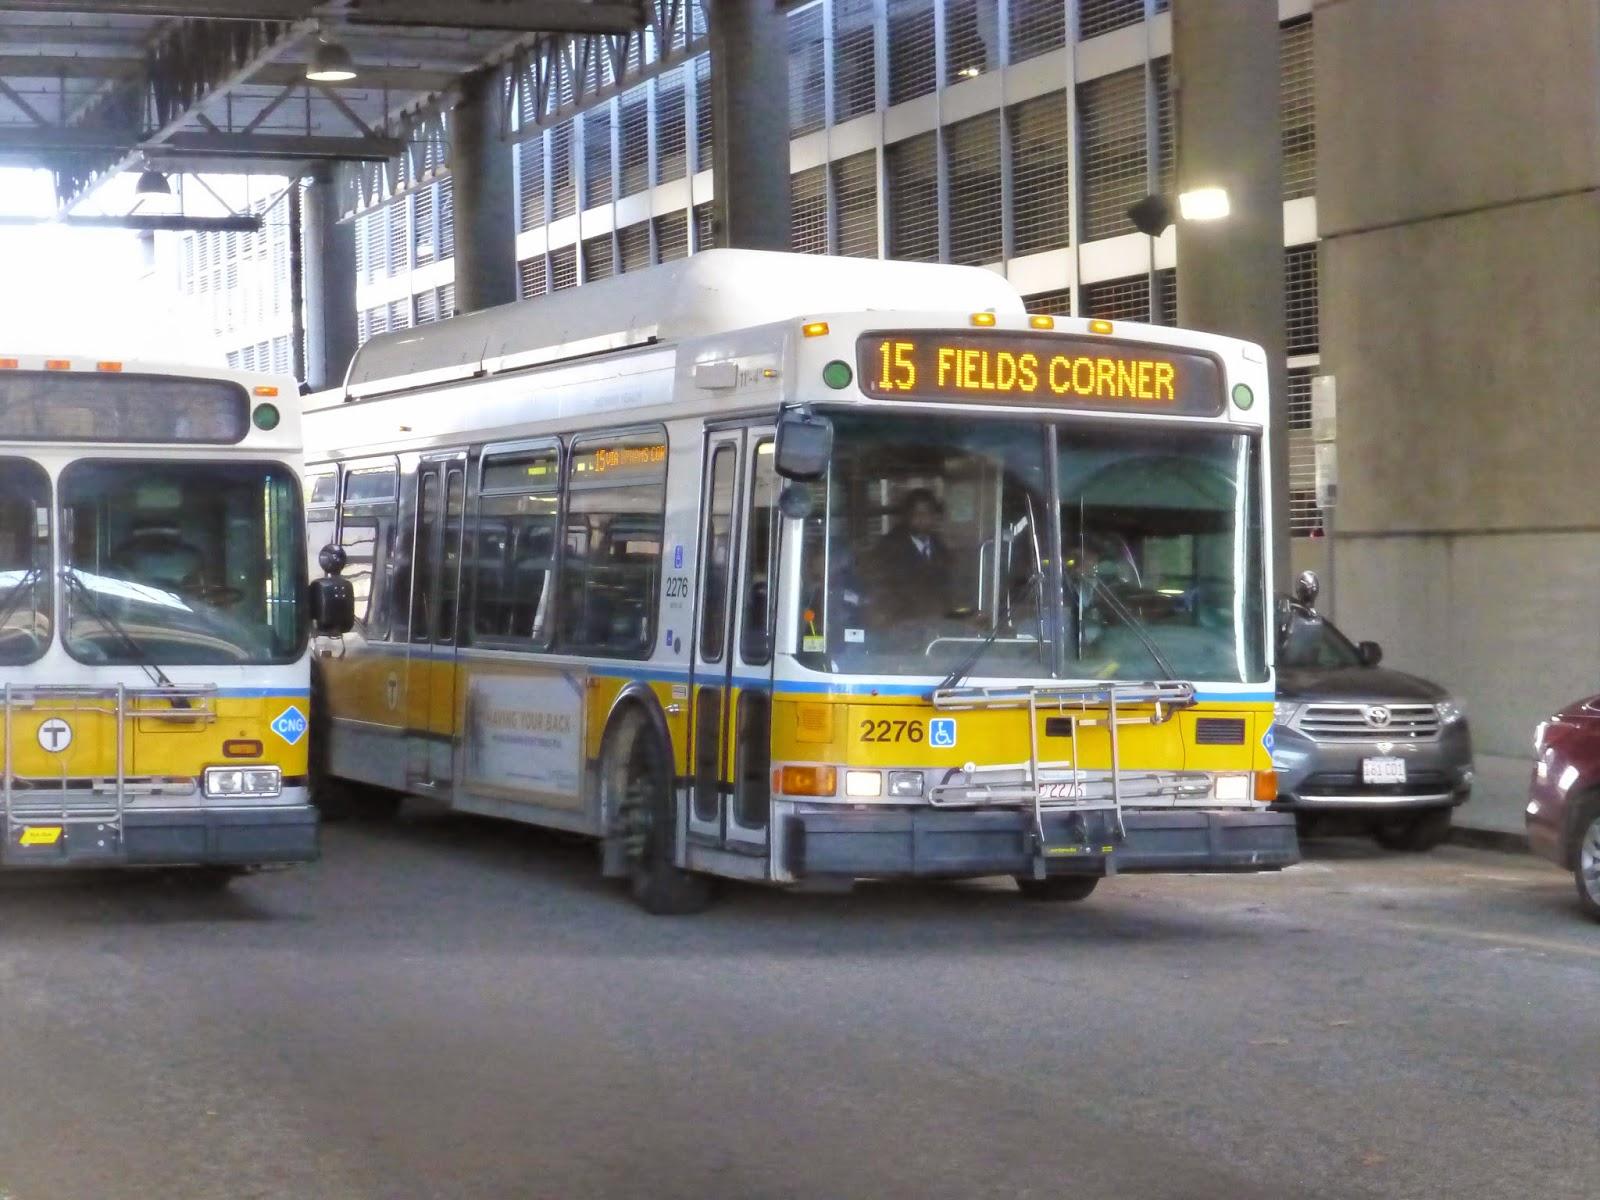 15 (Kane Square or Fields Corner Station – Ruggles Station via Uphams Corner)